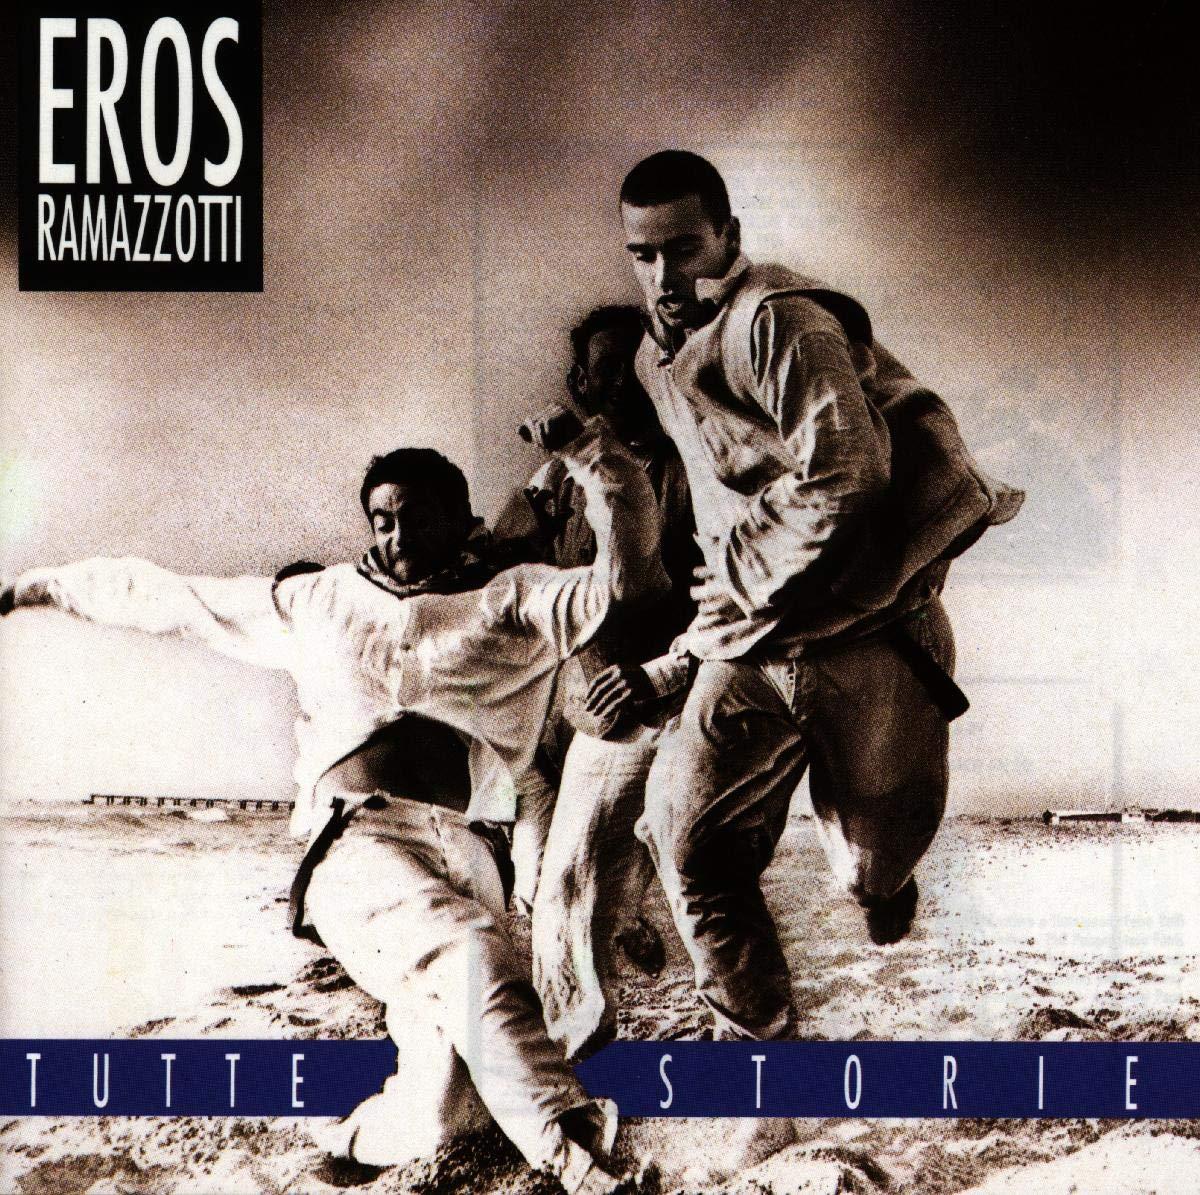 Eros Ramazzotti - Tutte Stories - CD /plast/